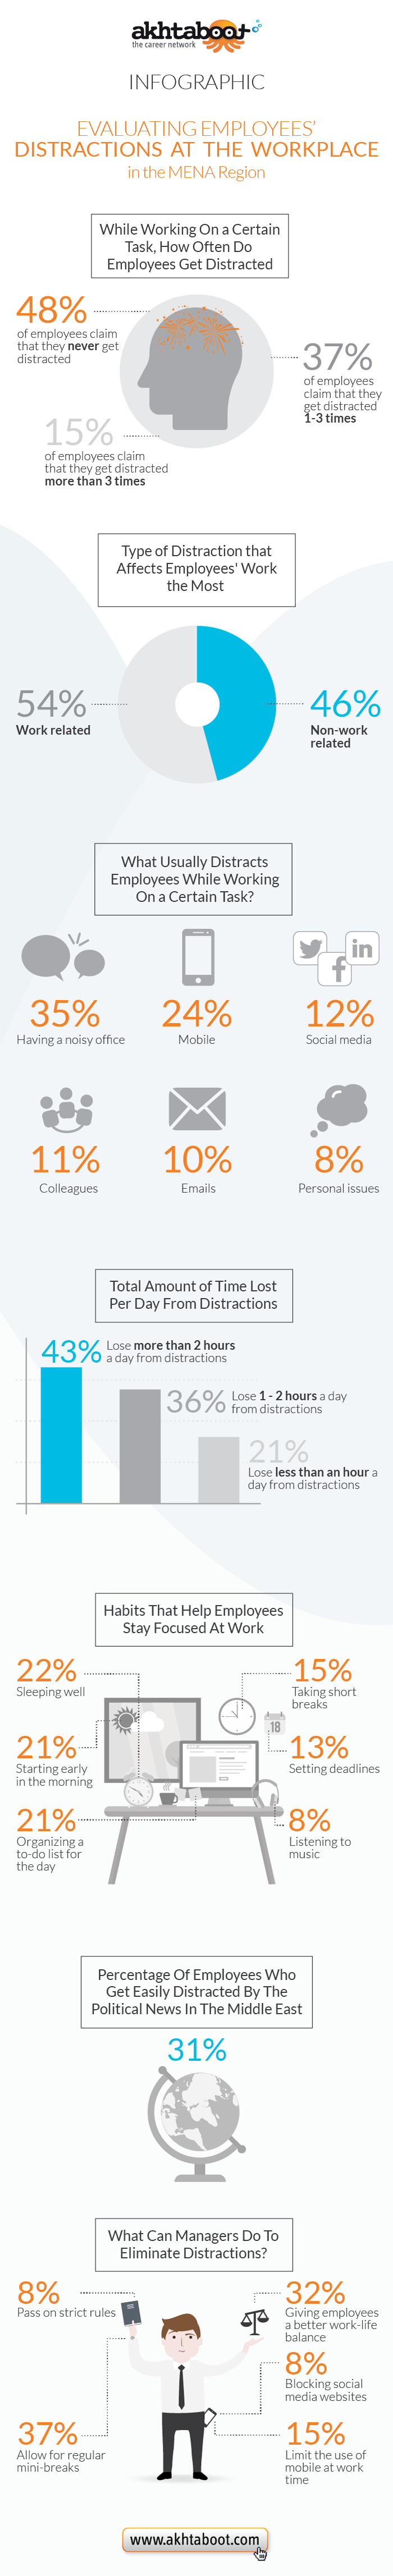 infographic_2015_Q2